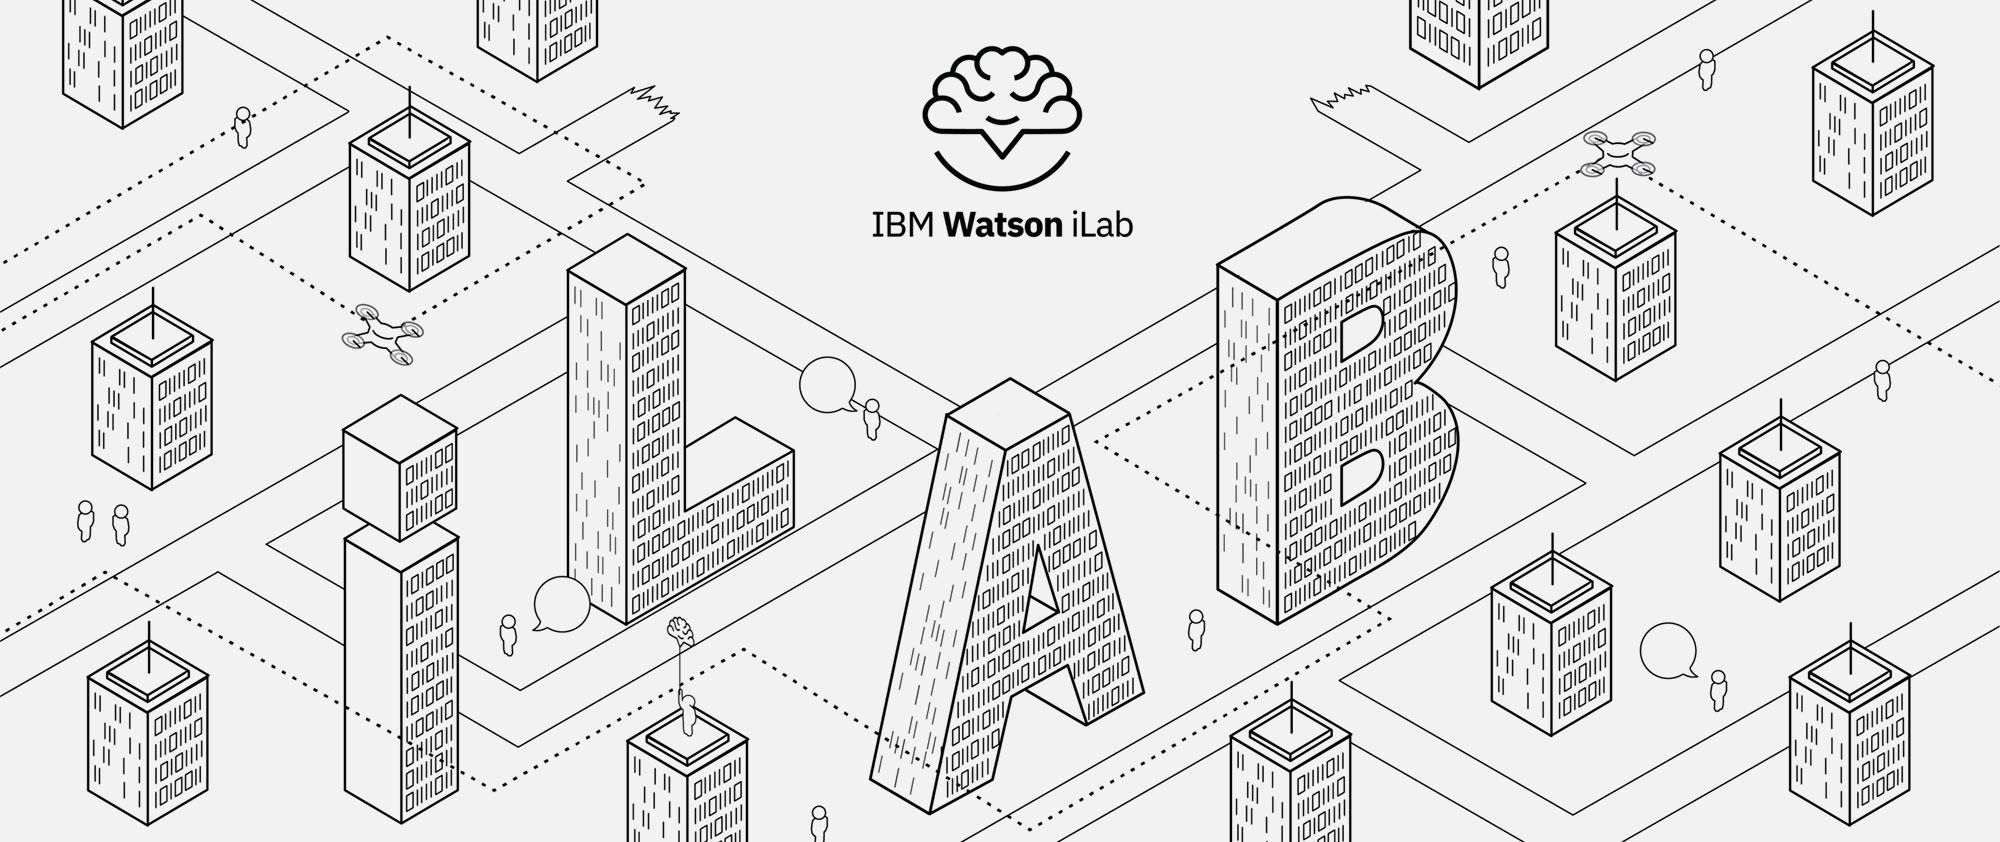 IBM Watson iLab Theme